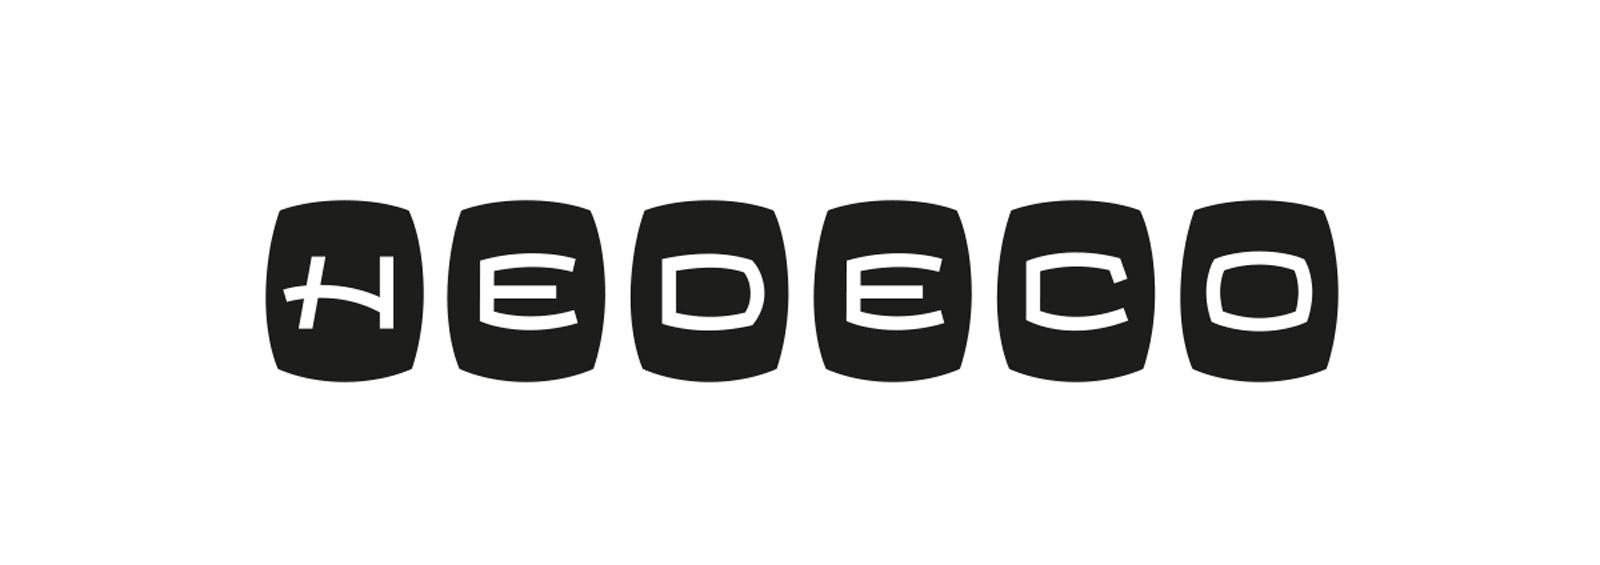 Hedeco Lichtmesser Logo Lettering